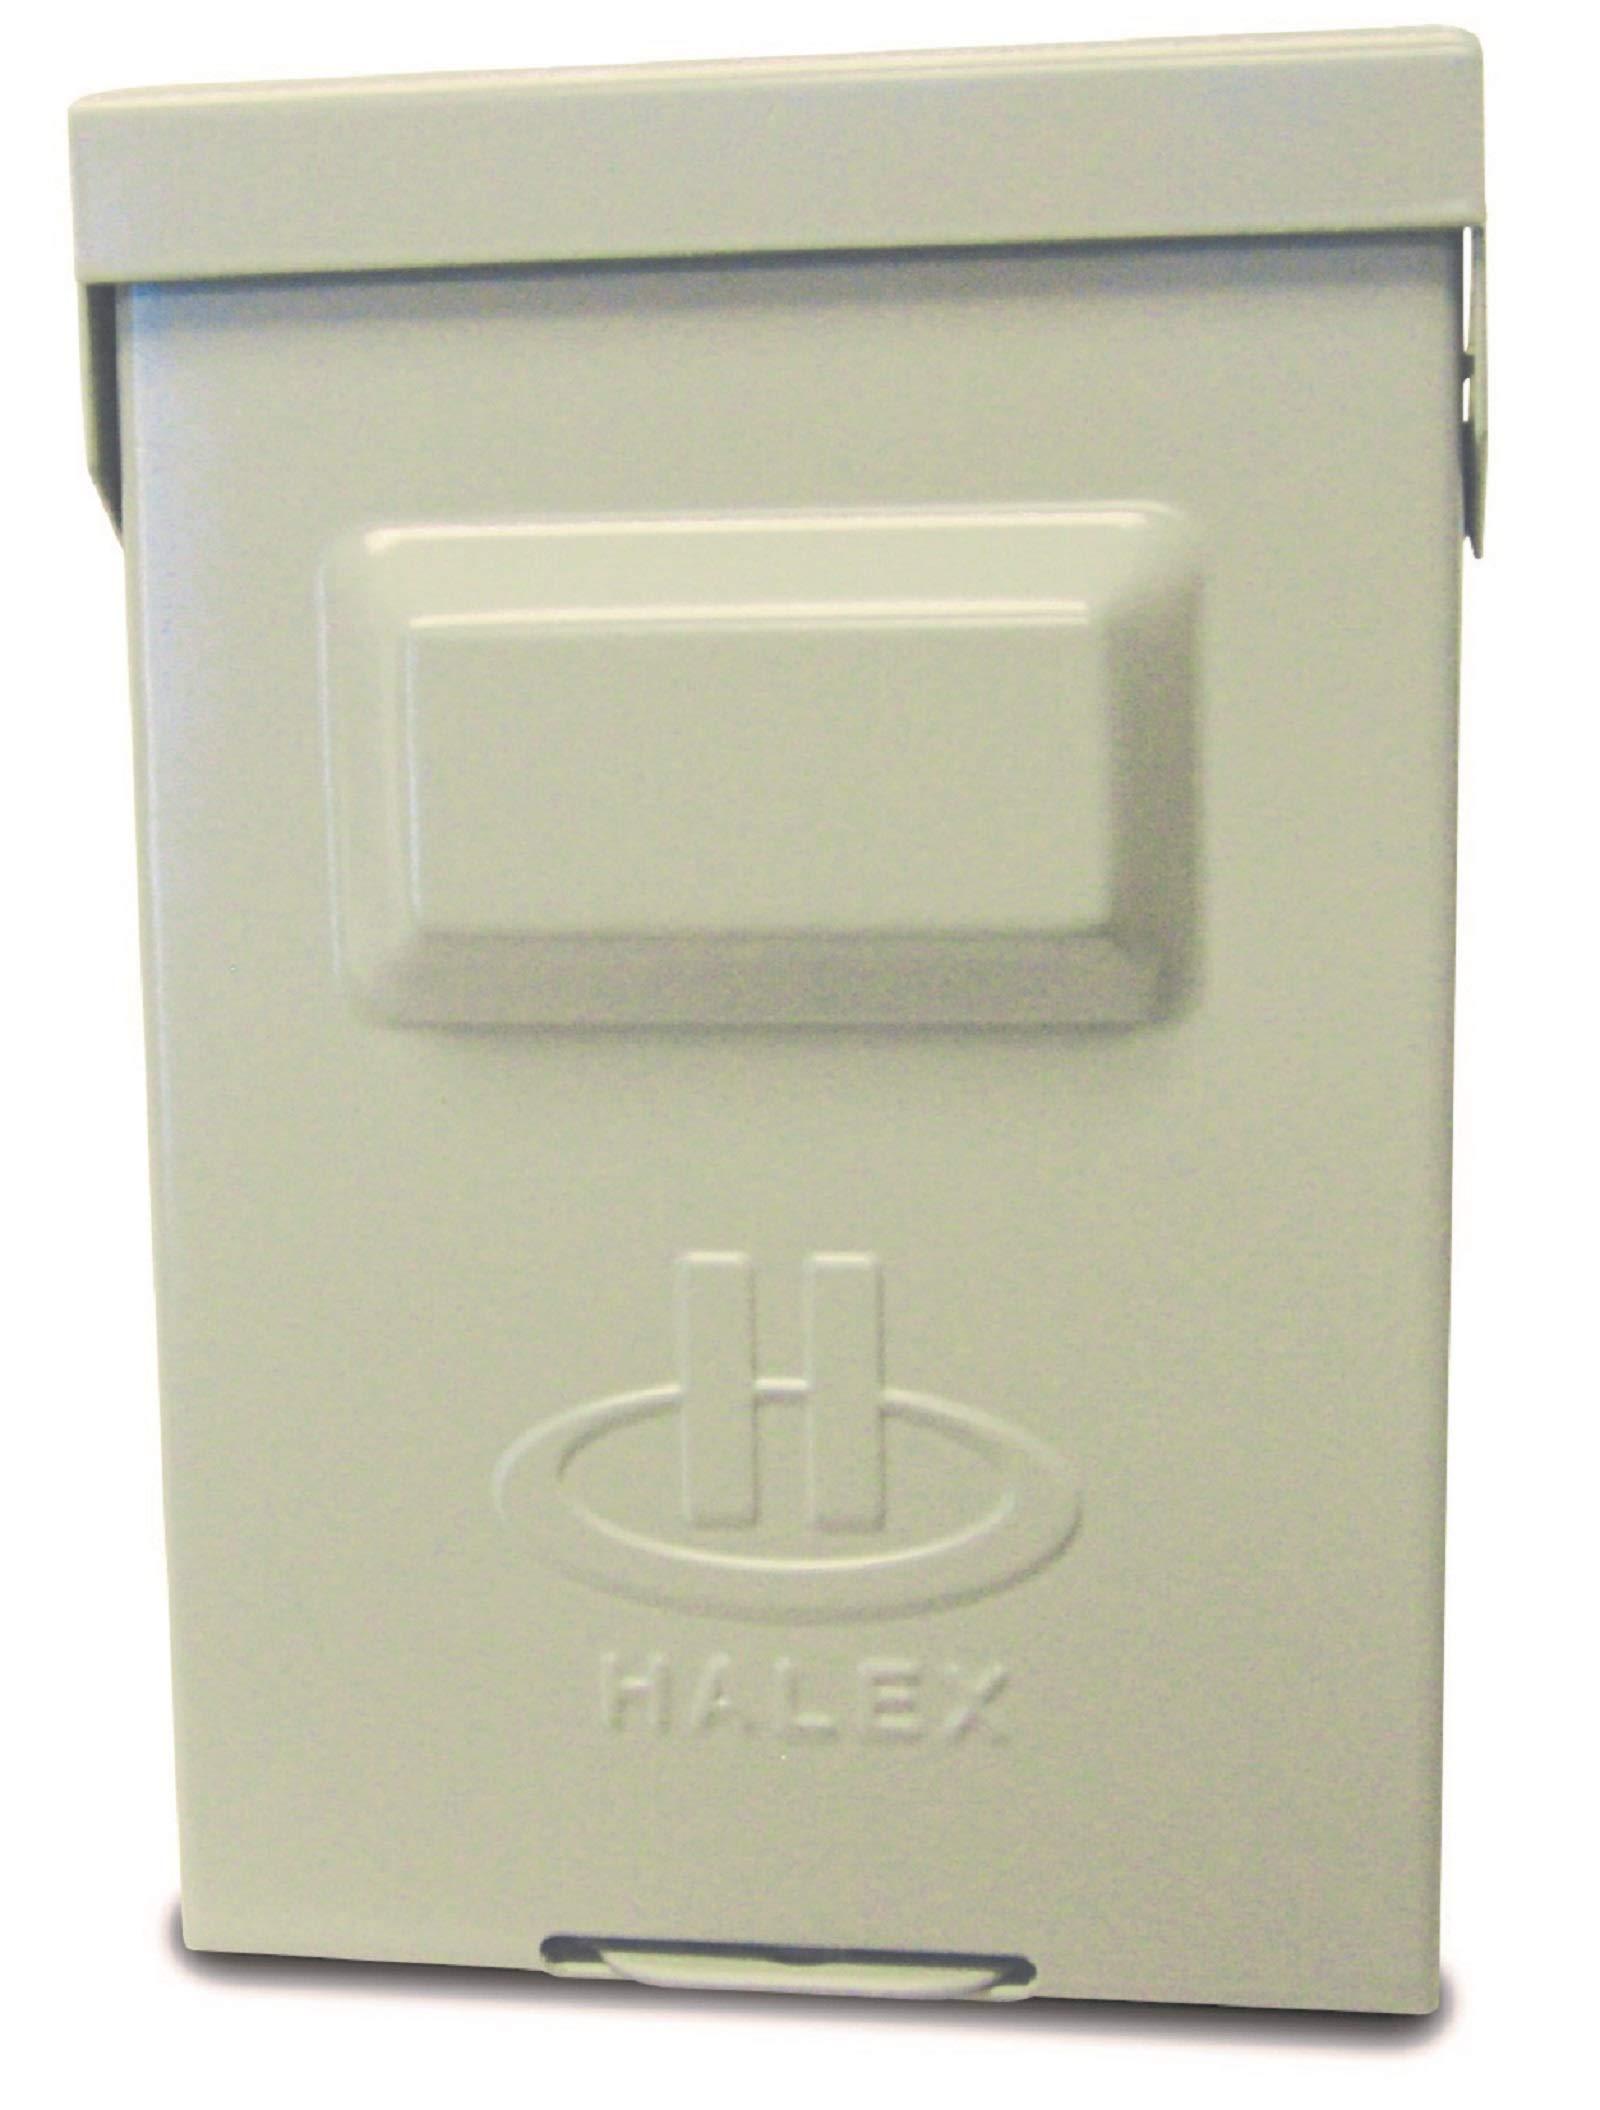 Halex 60 Amp 120 240 Volt Non Fuse Meta Buy Online In Cayman Islands At Desertcart